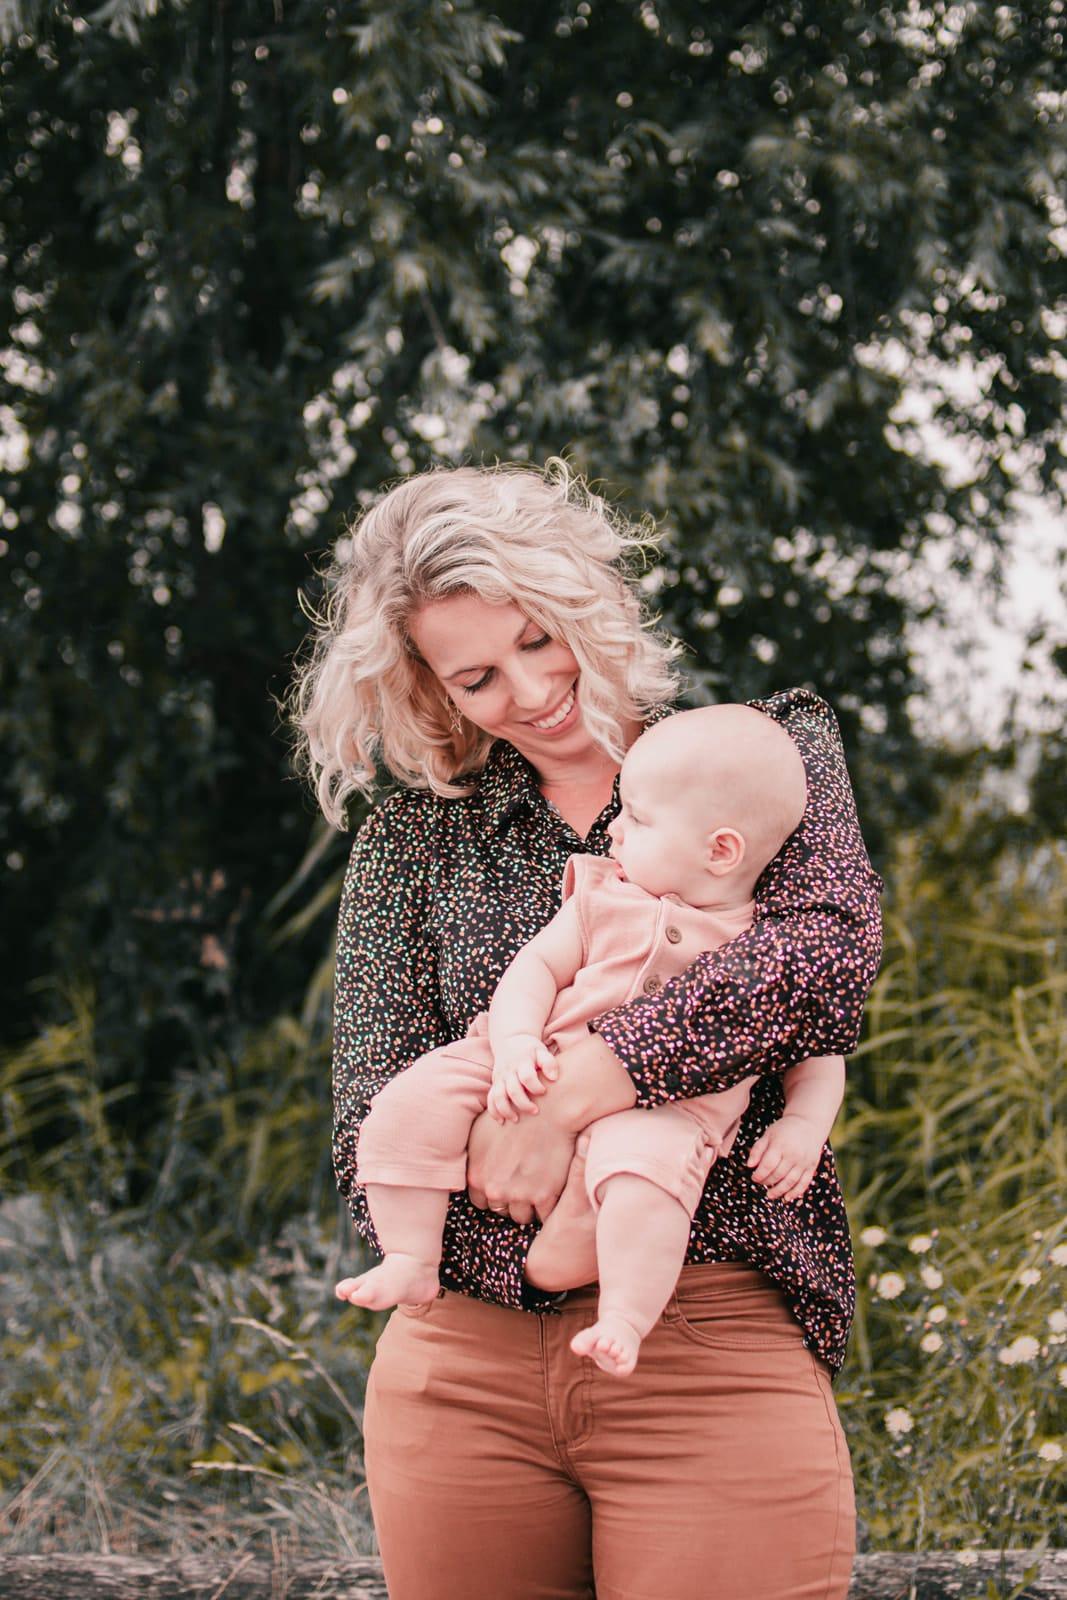 kinderfysiotherapie Krimpenerwaard Joyce Zwijnenburg Groen Baby en Kind